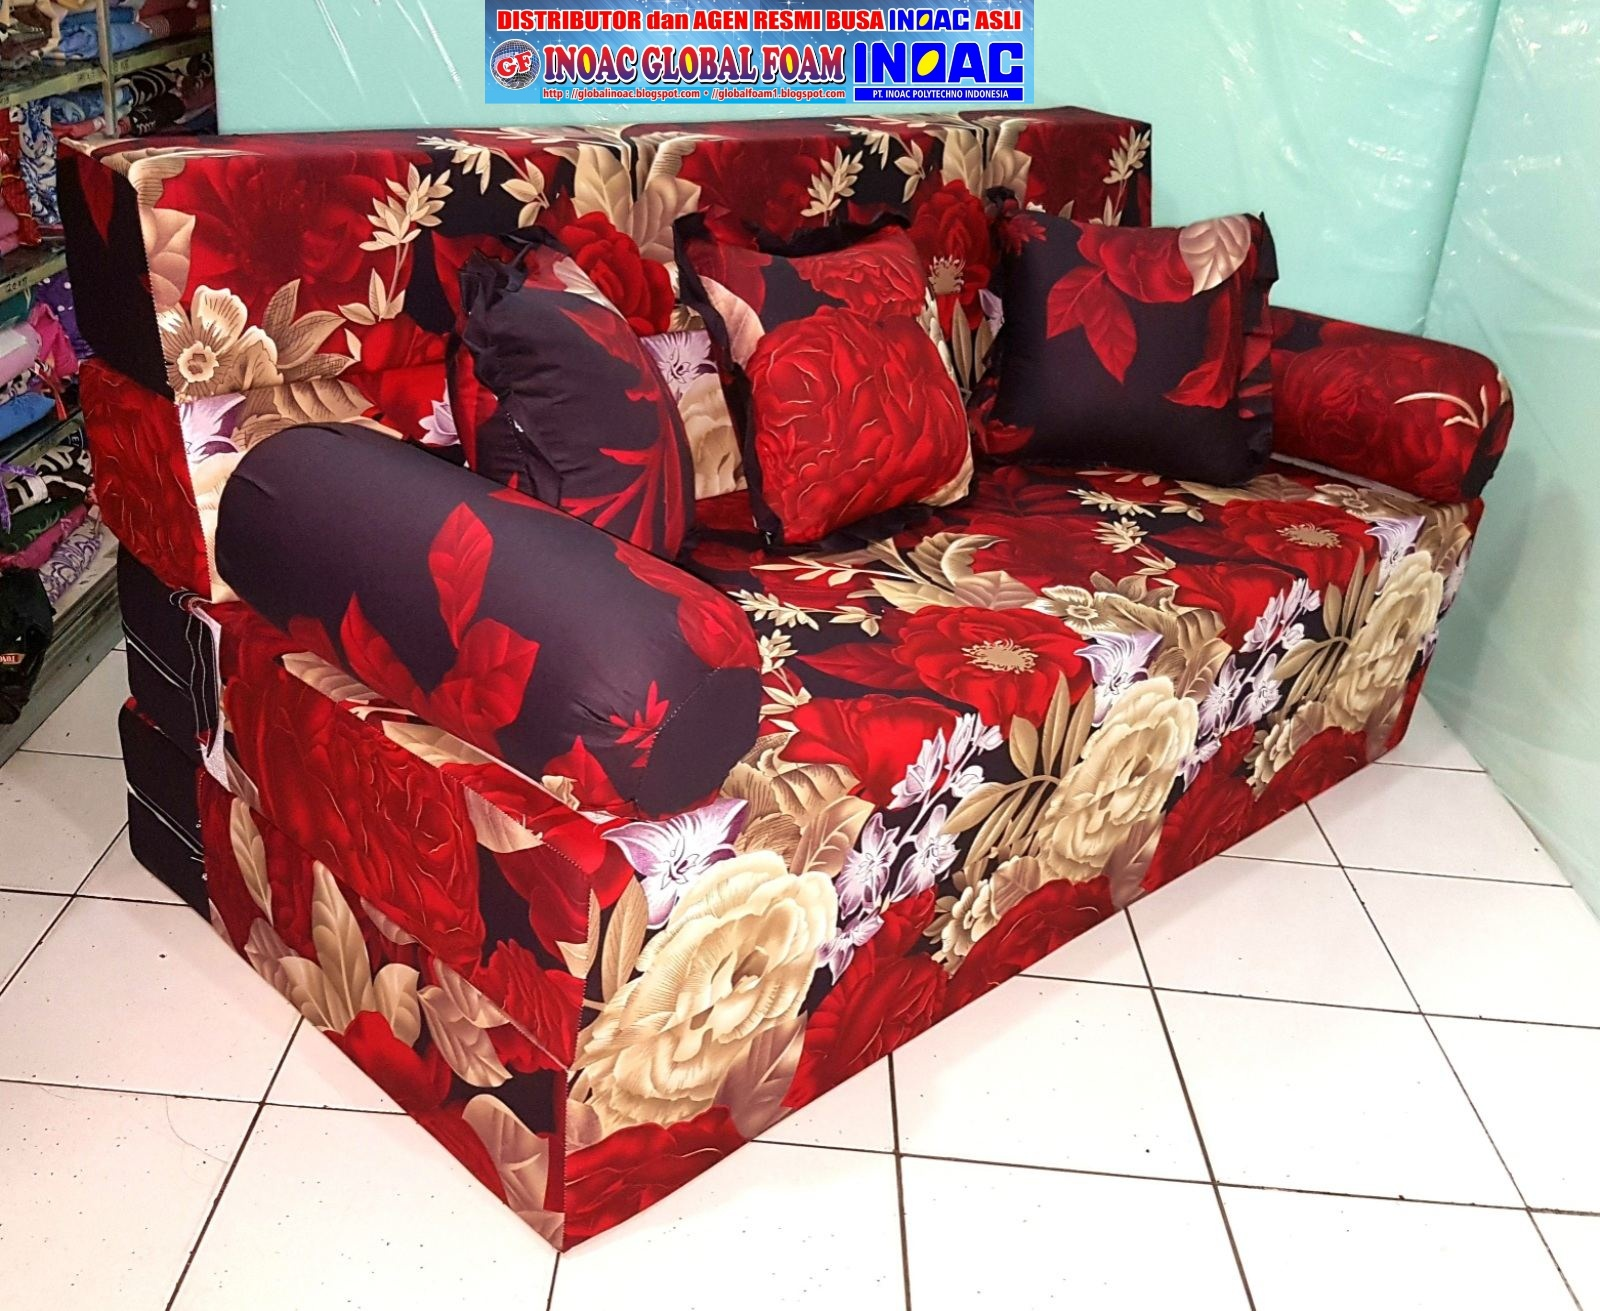 harga sofa bed inoac no 1 childrens foam kasur 2018 distributor busa asli global